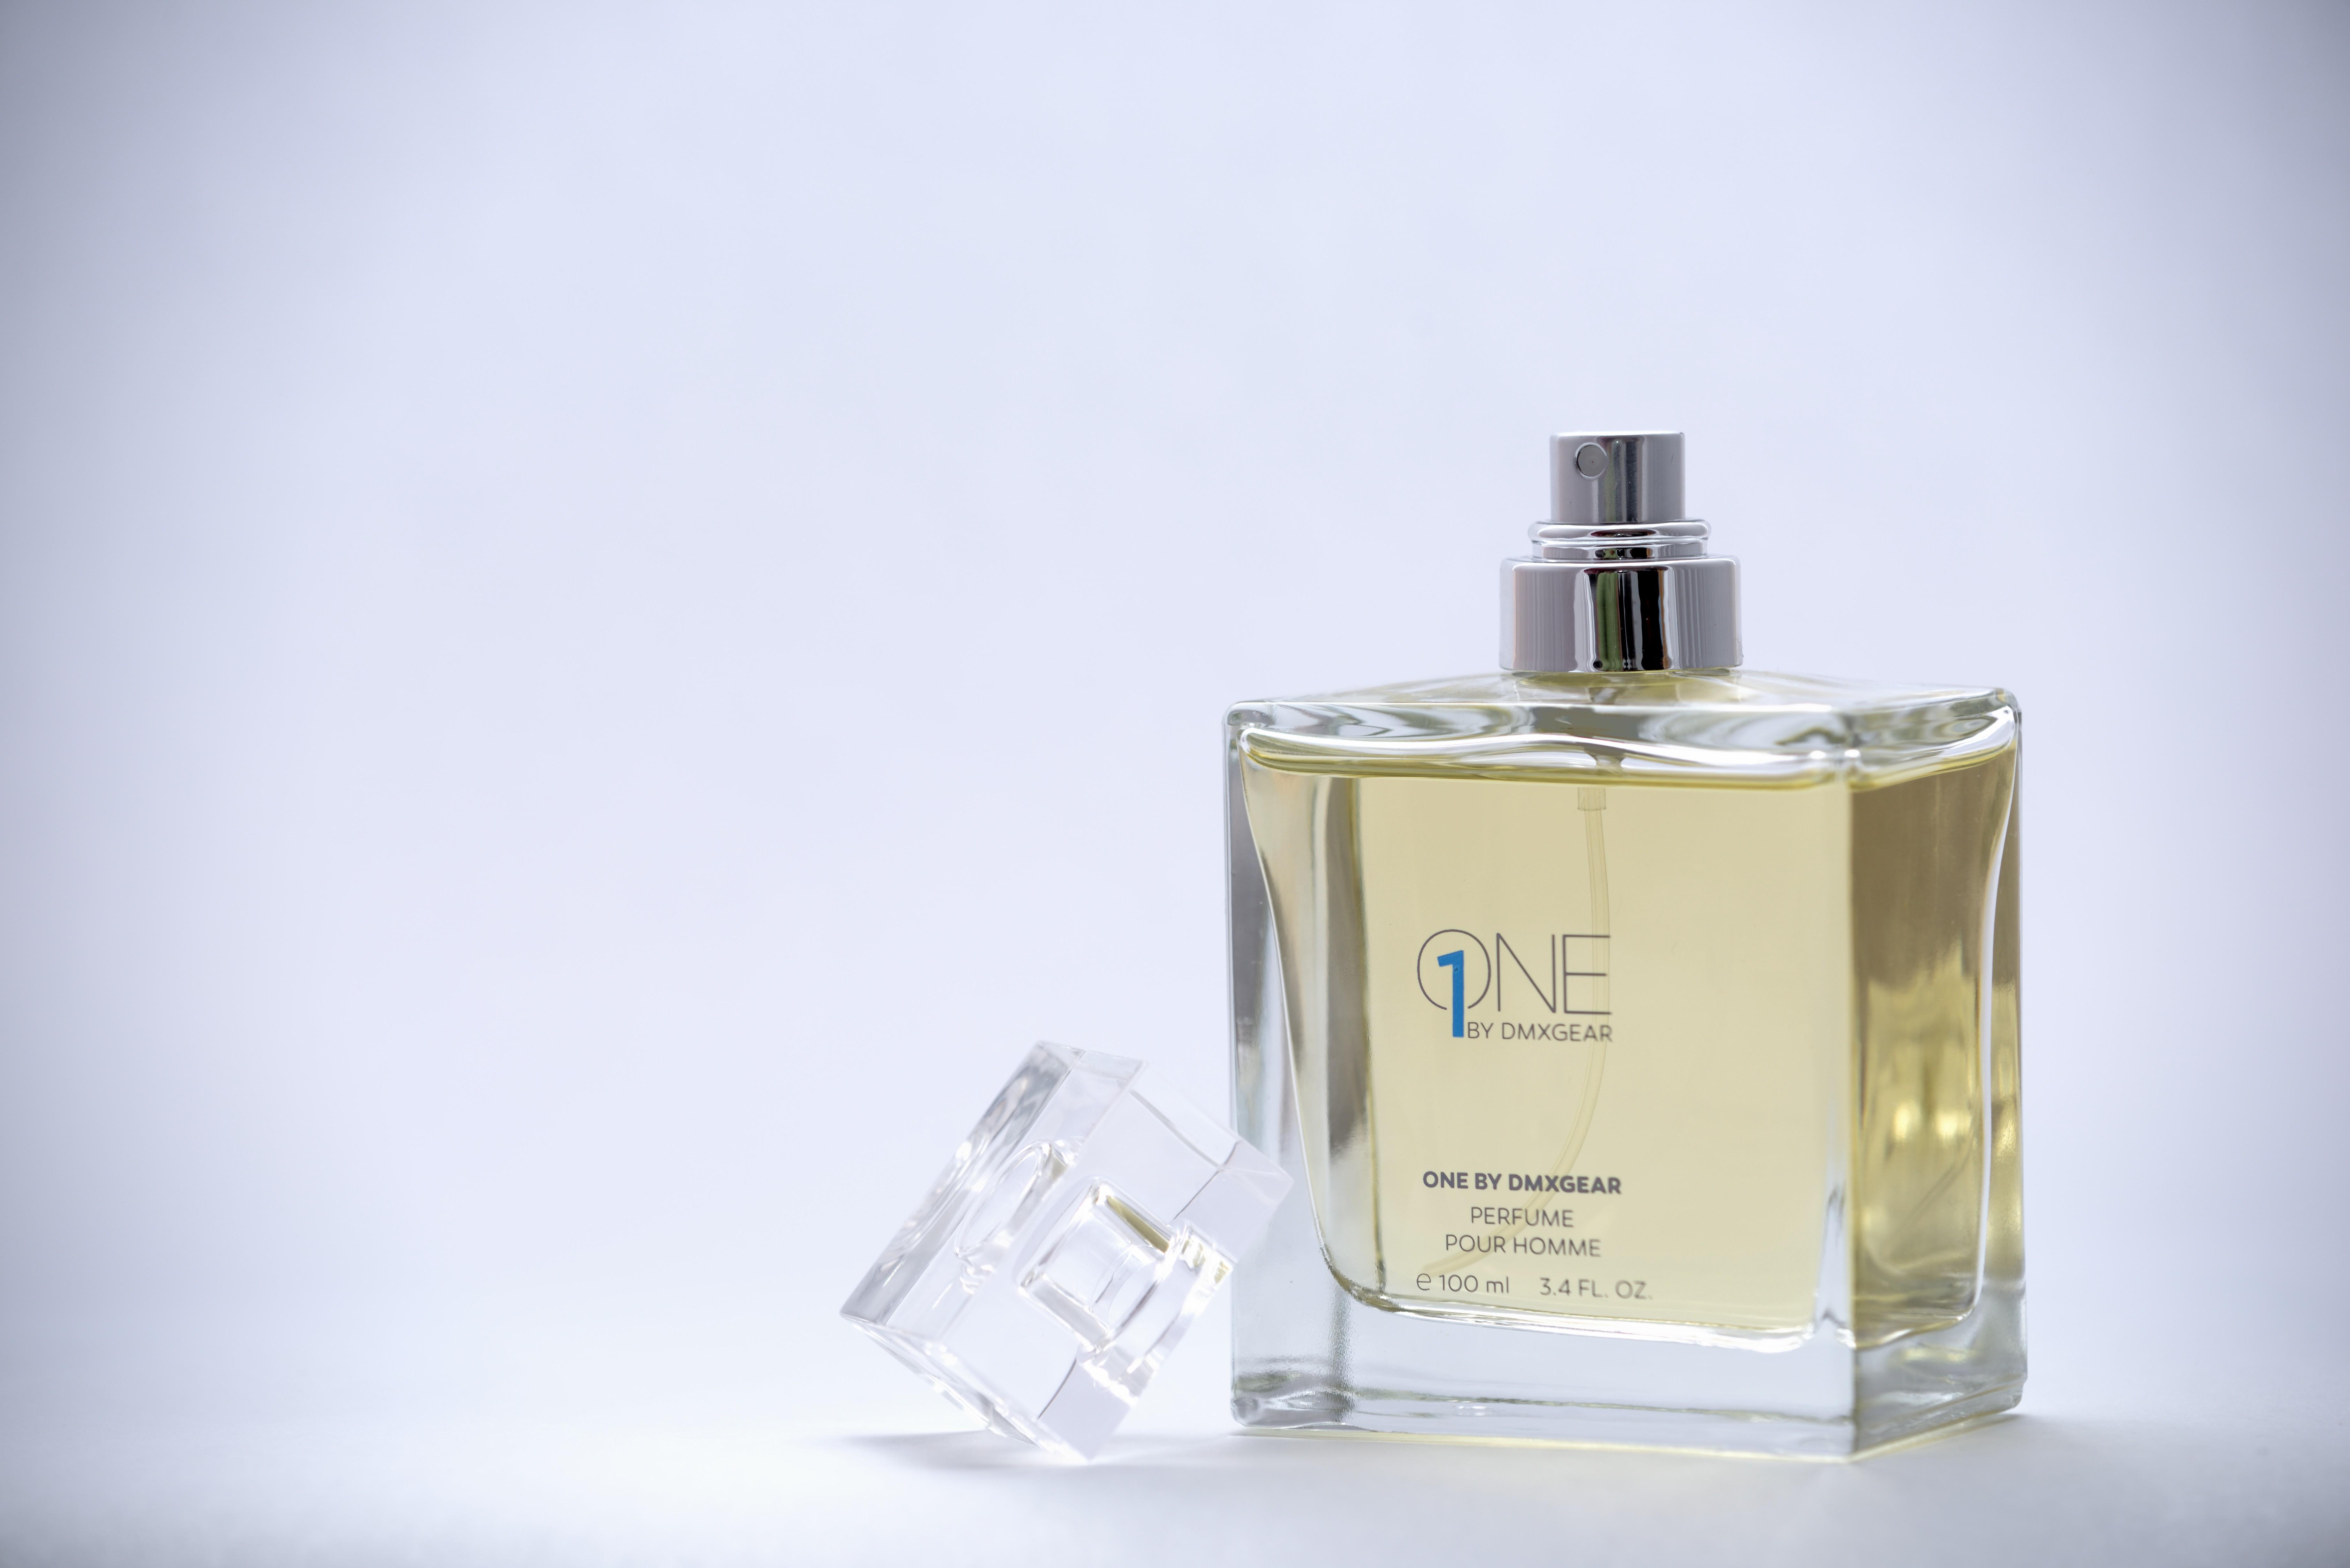 eead64ab4 Novy pansky parfem gucci levně | Mobilmania zboží